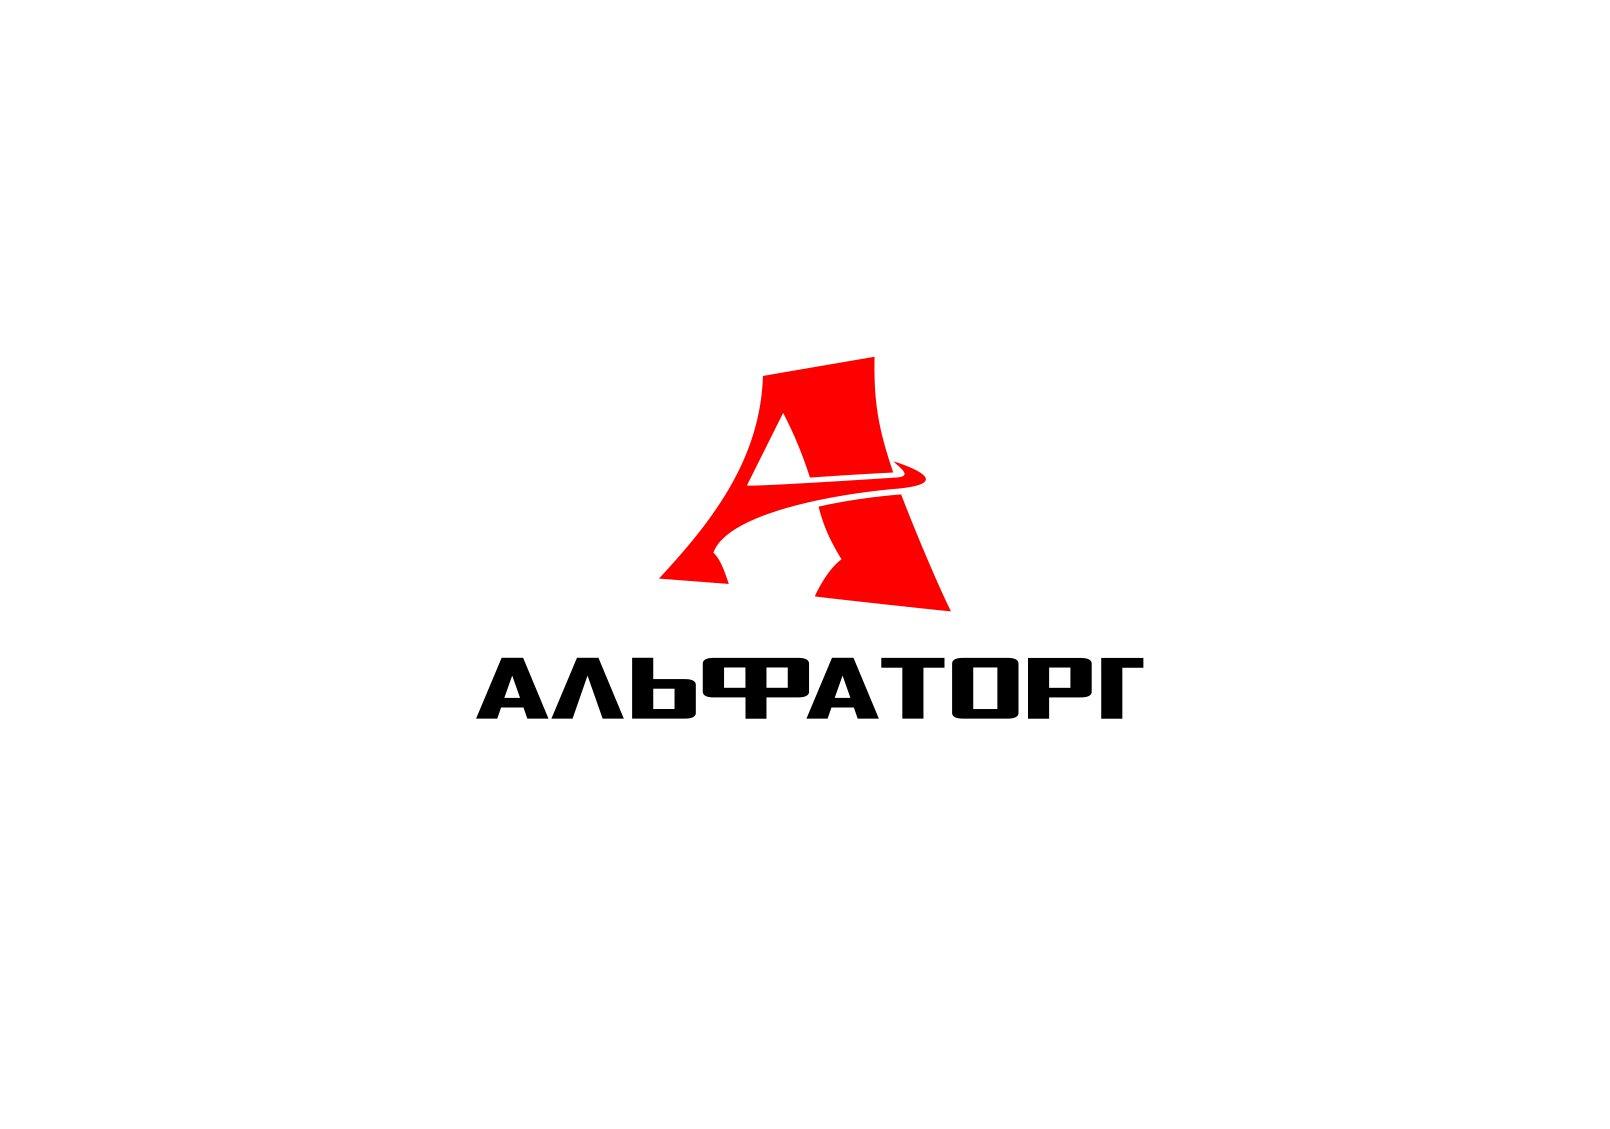 Логотип и фирменный стиль фото f_6915f08dffc64ac0.jpg